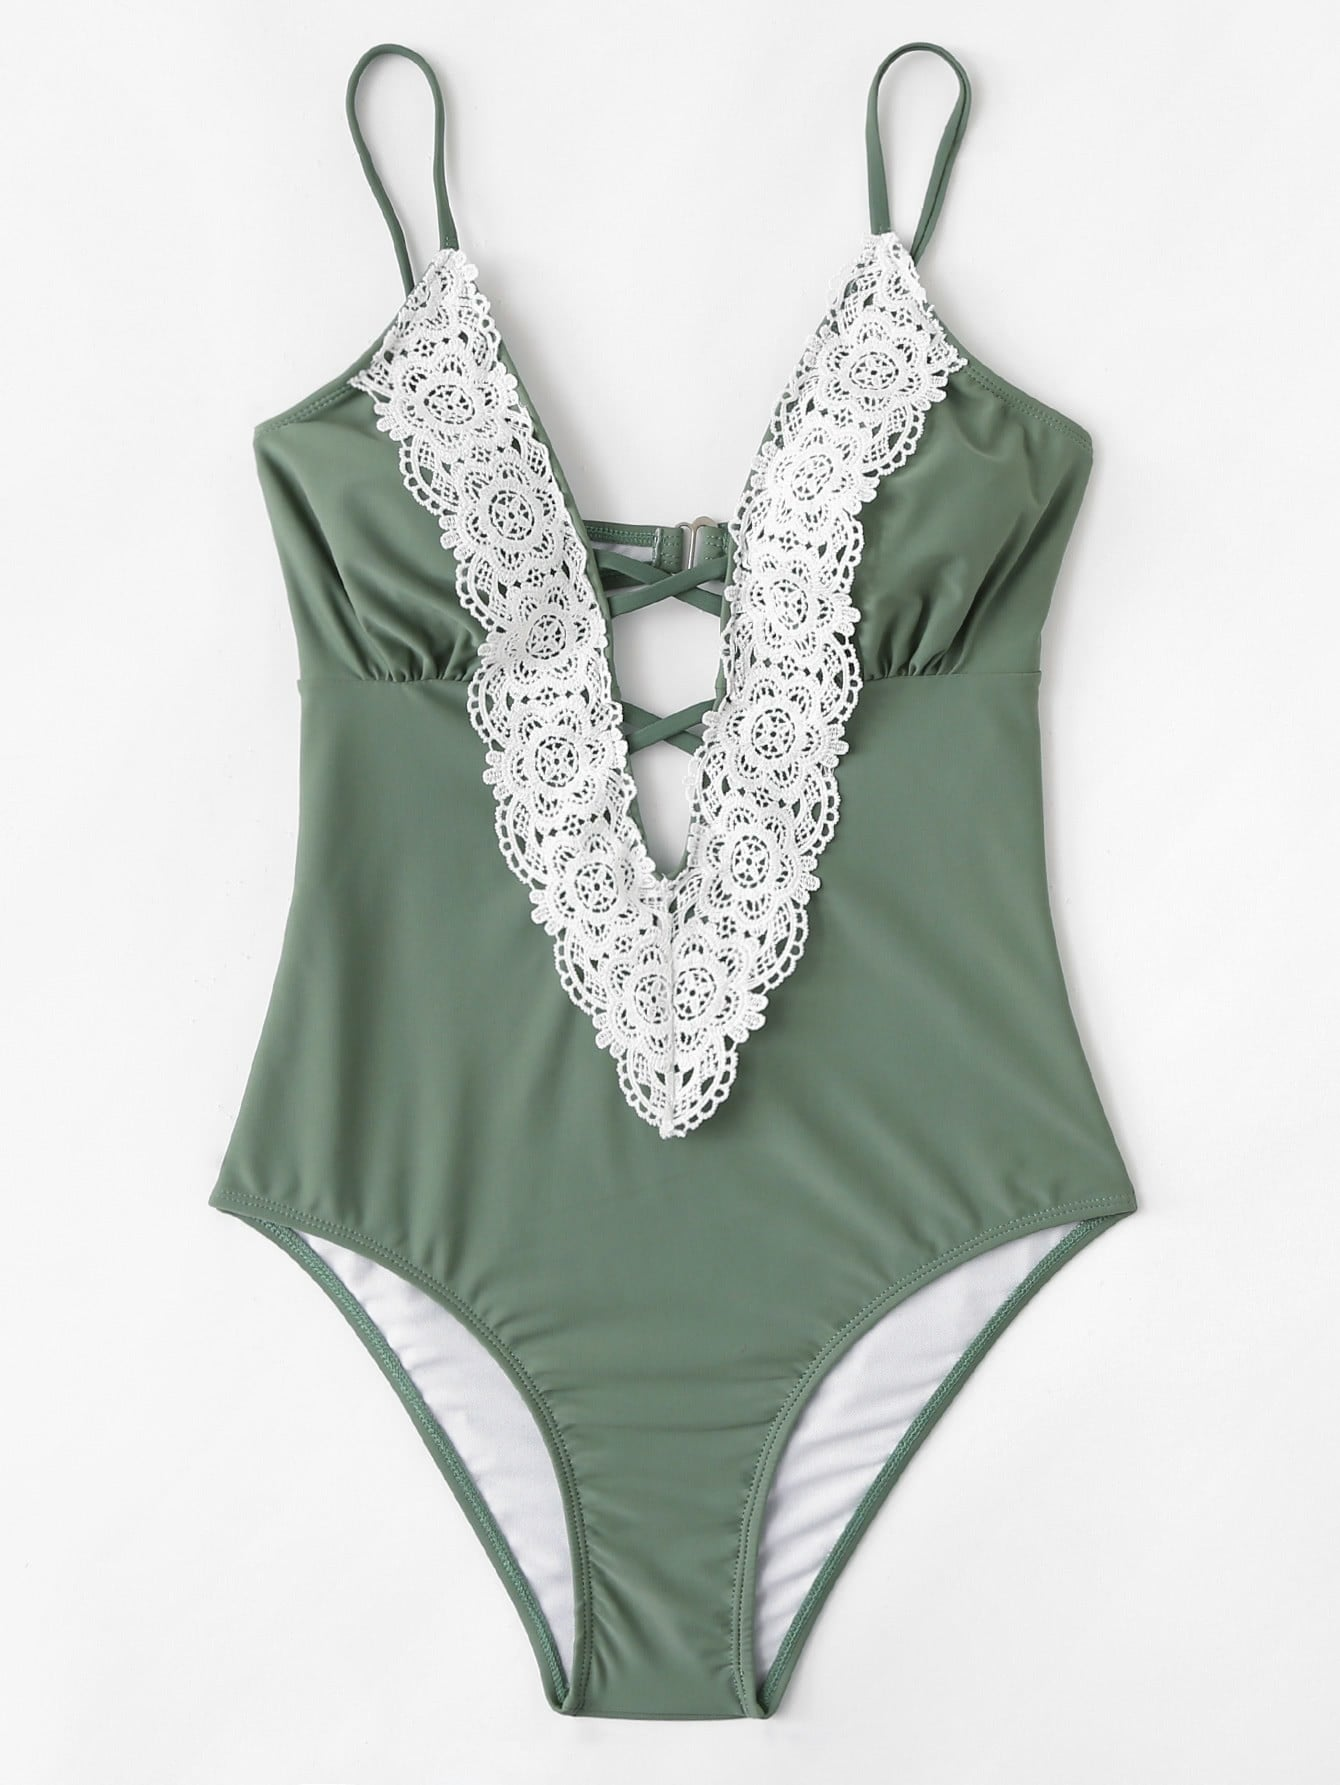 Contrast Lace Swimsuit contrast lace striped swimsuit